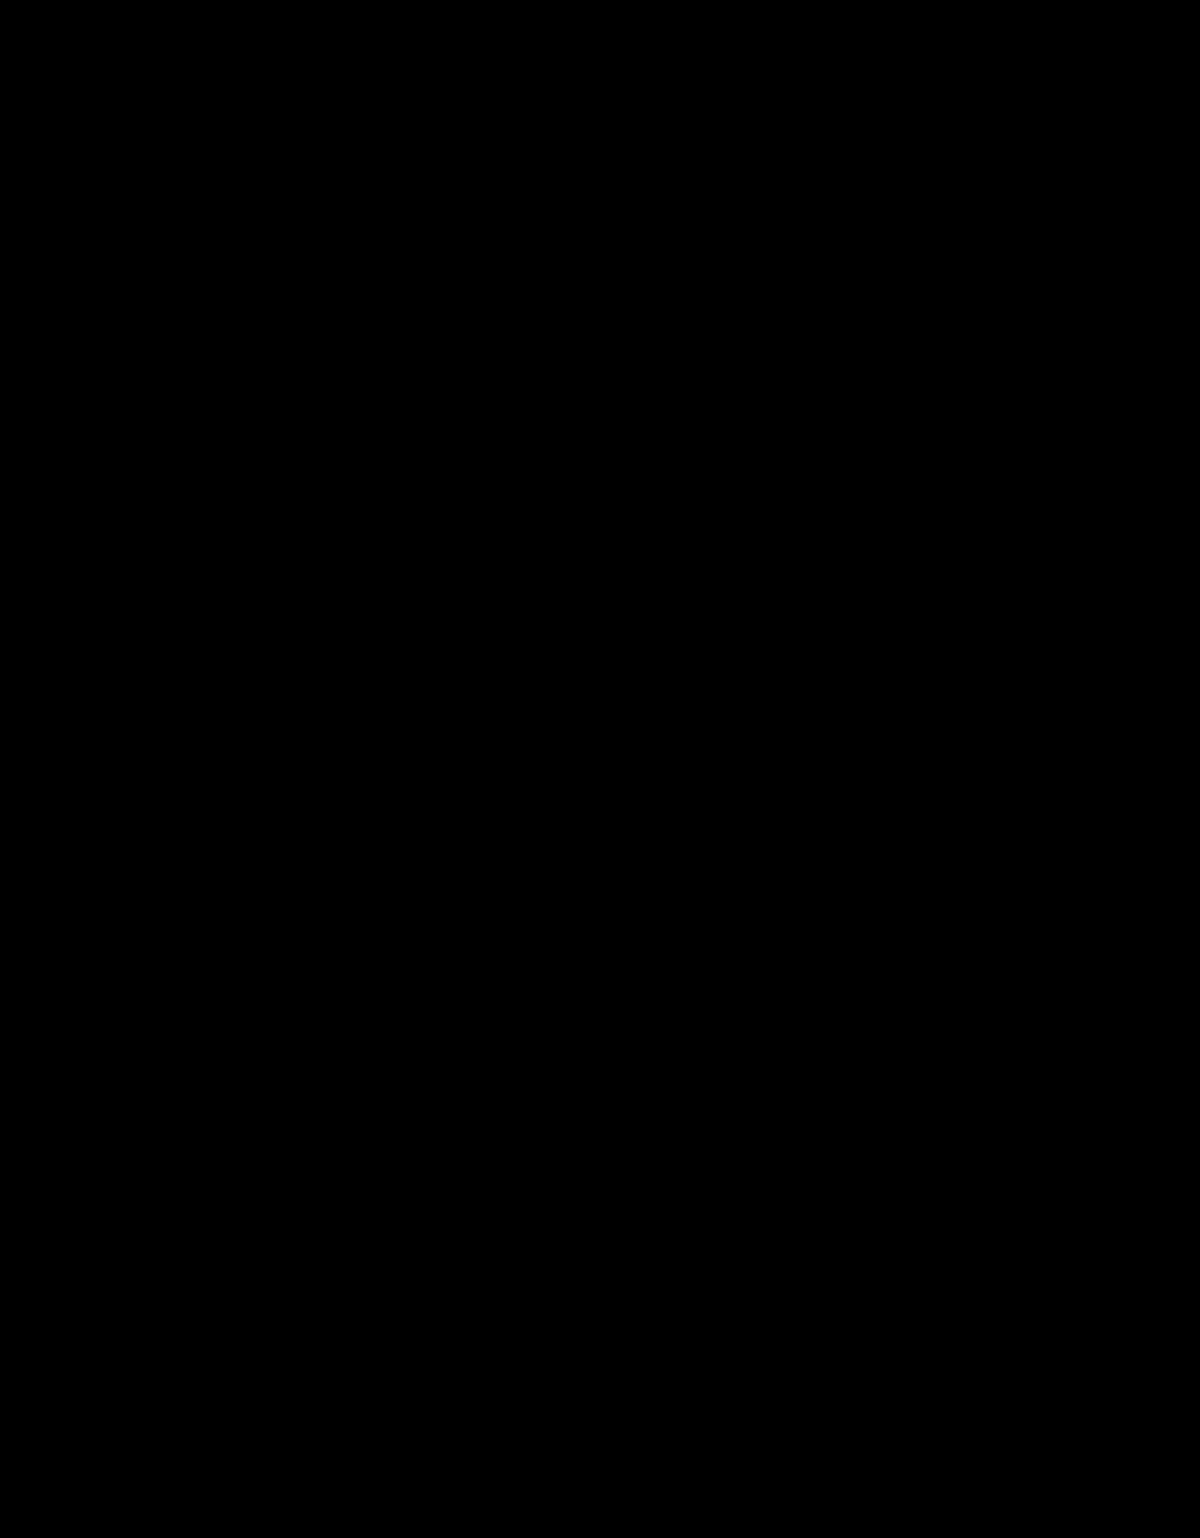 logo_Radboud3